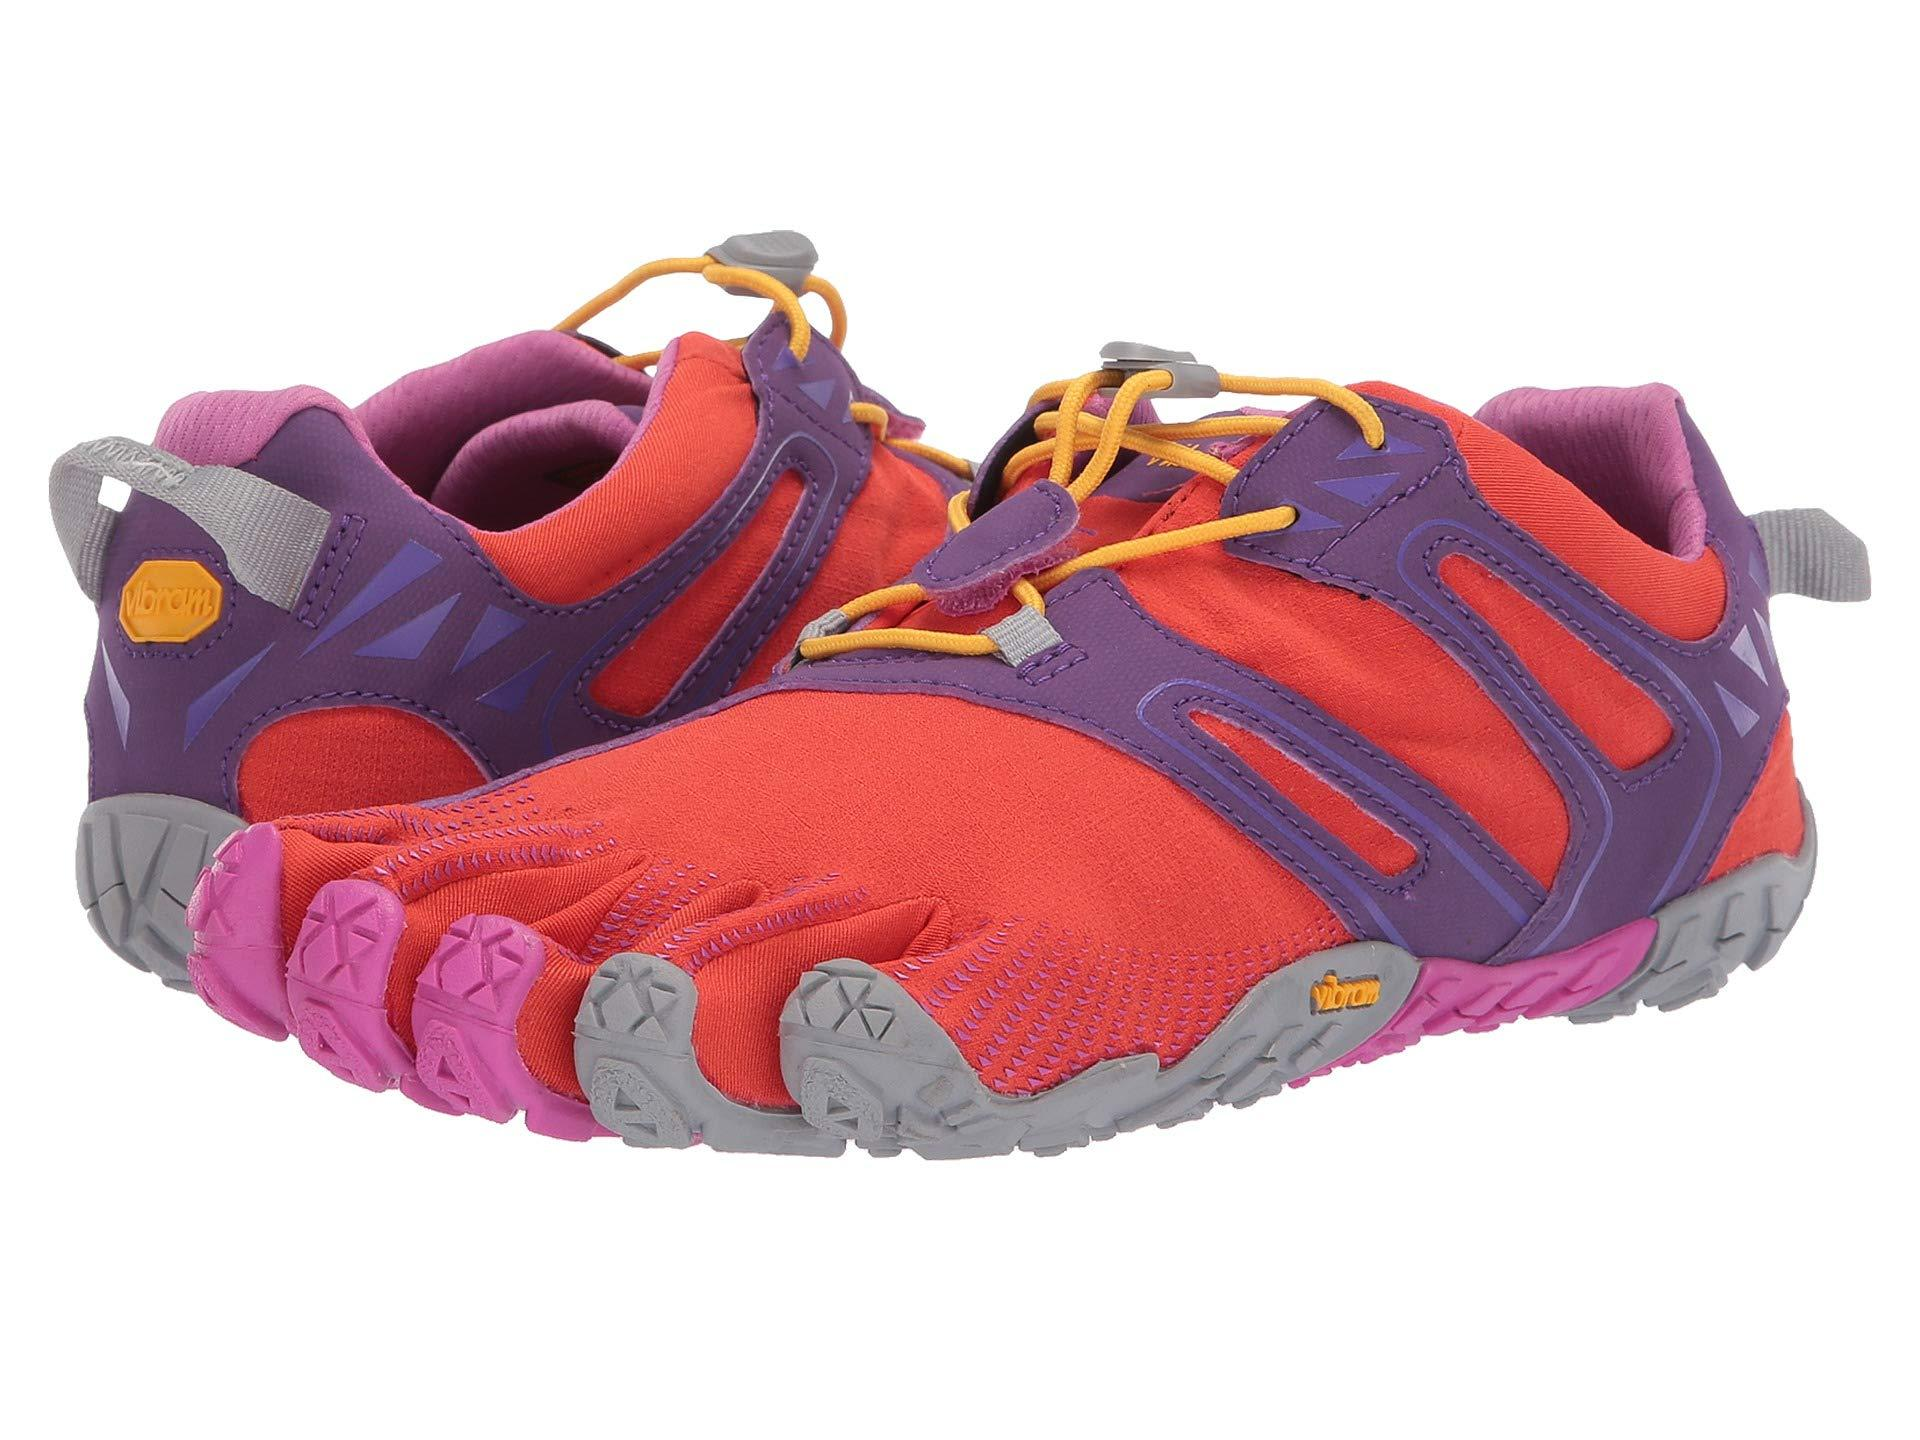 aab4585c6578 Lyst - Vibram Fivefingers V-trail (magenta orange) Women s Shoes in ...